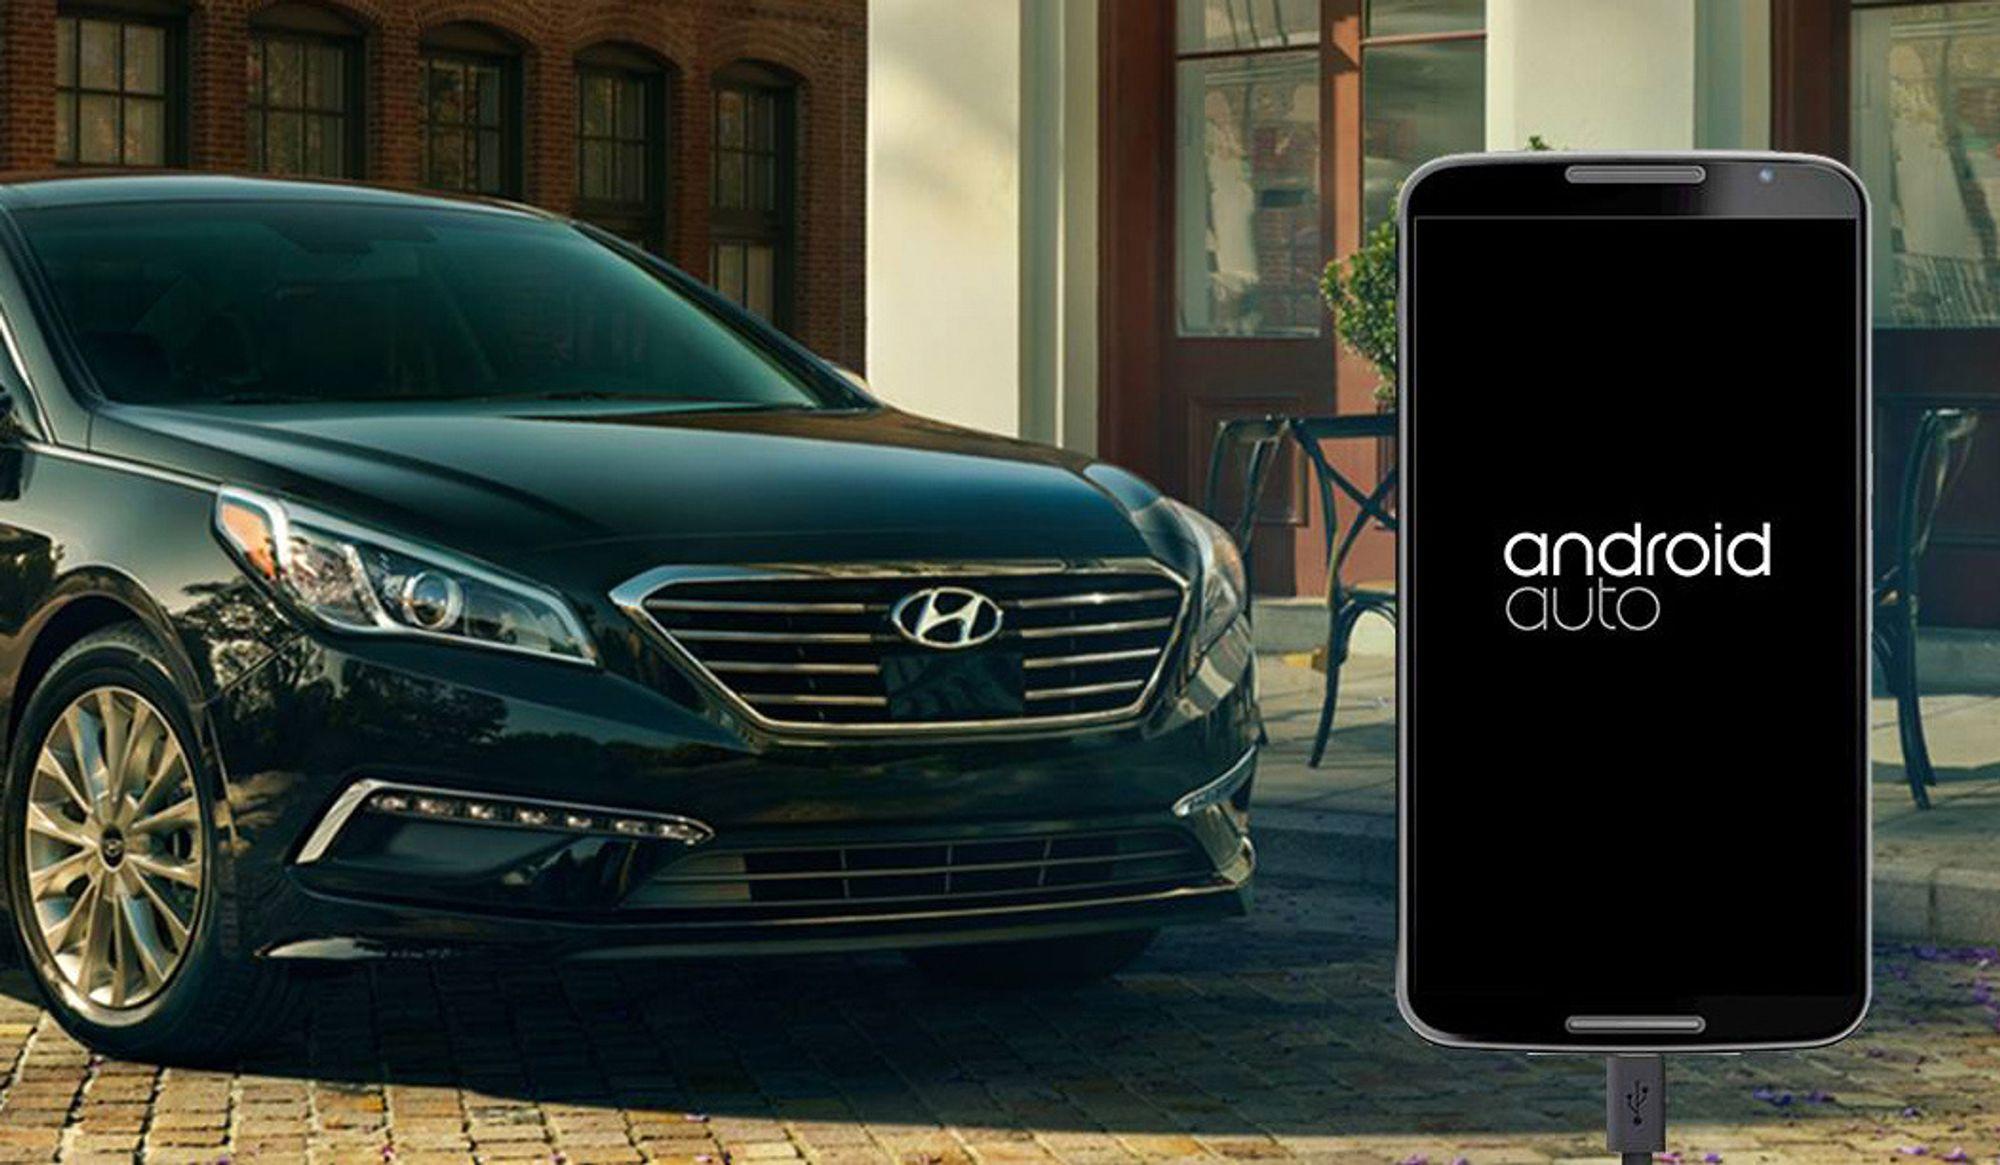 test android auto apper uten kj pe ny bil. Black Bedroom Furniture Sets. Home Design Ideas